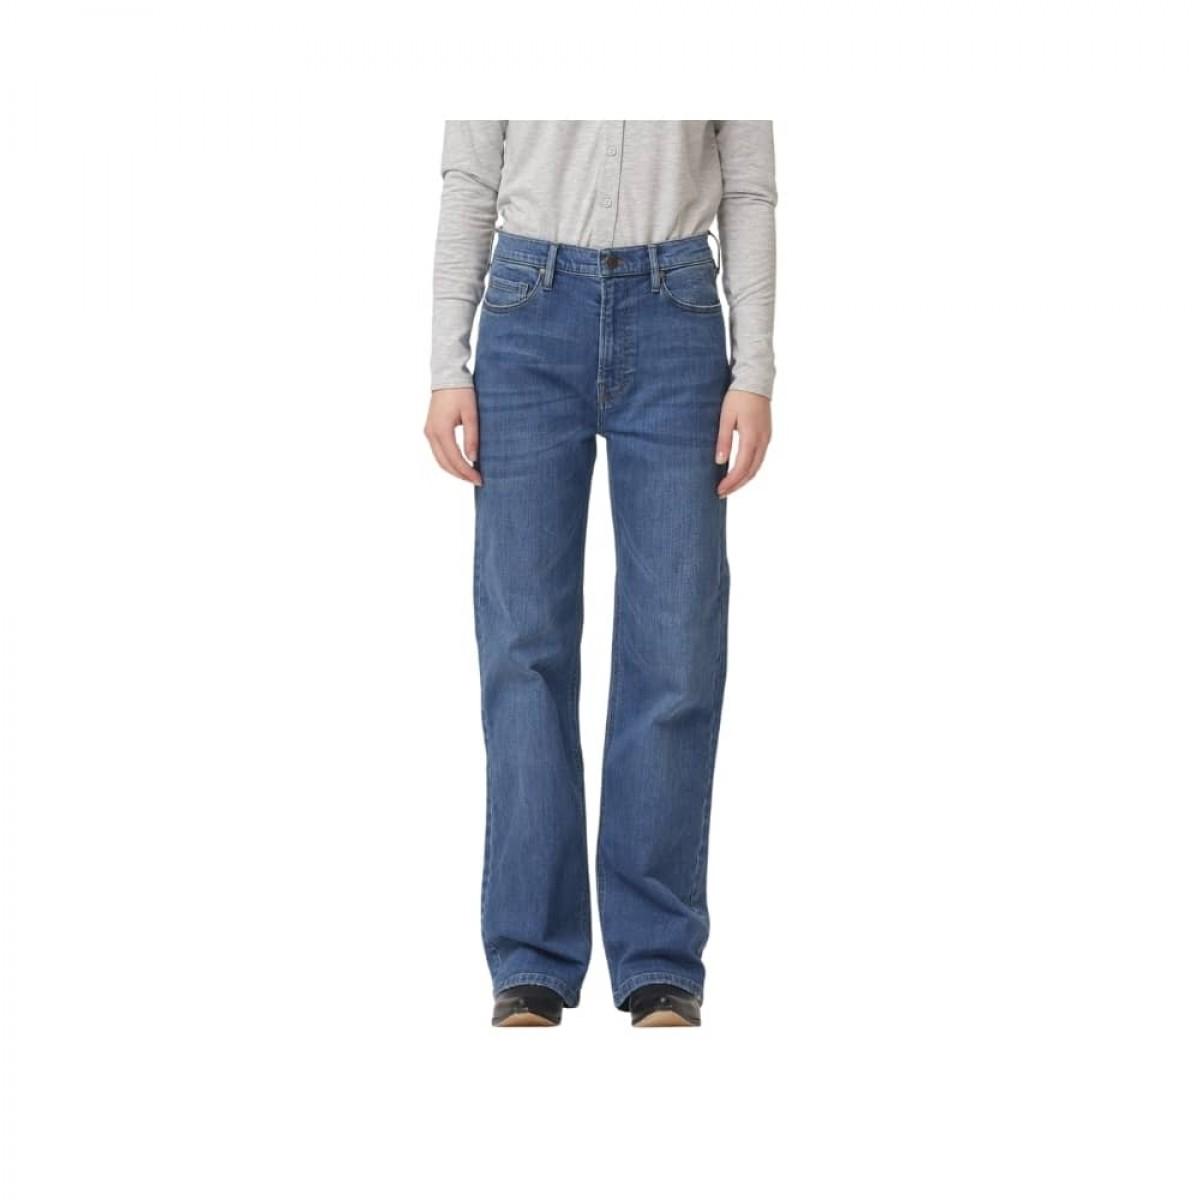 brown straight jeans - prato - denim blue - model 1